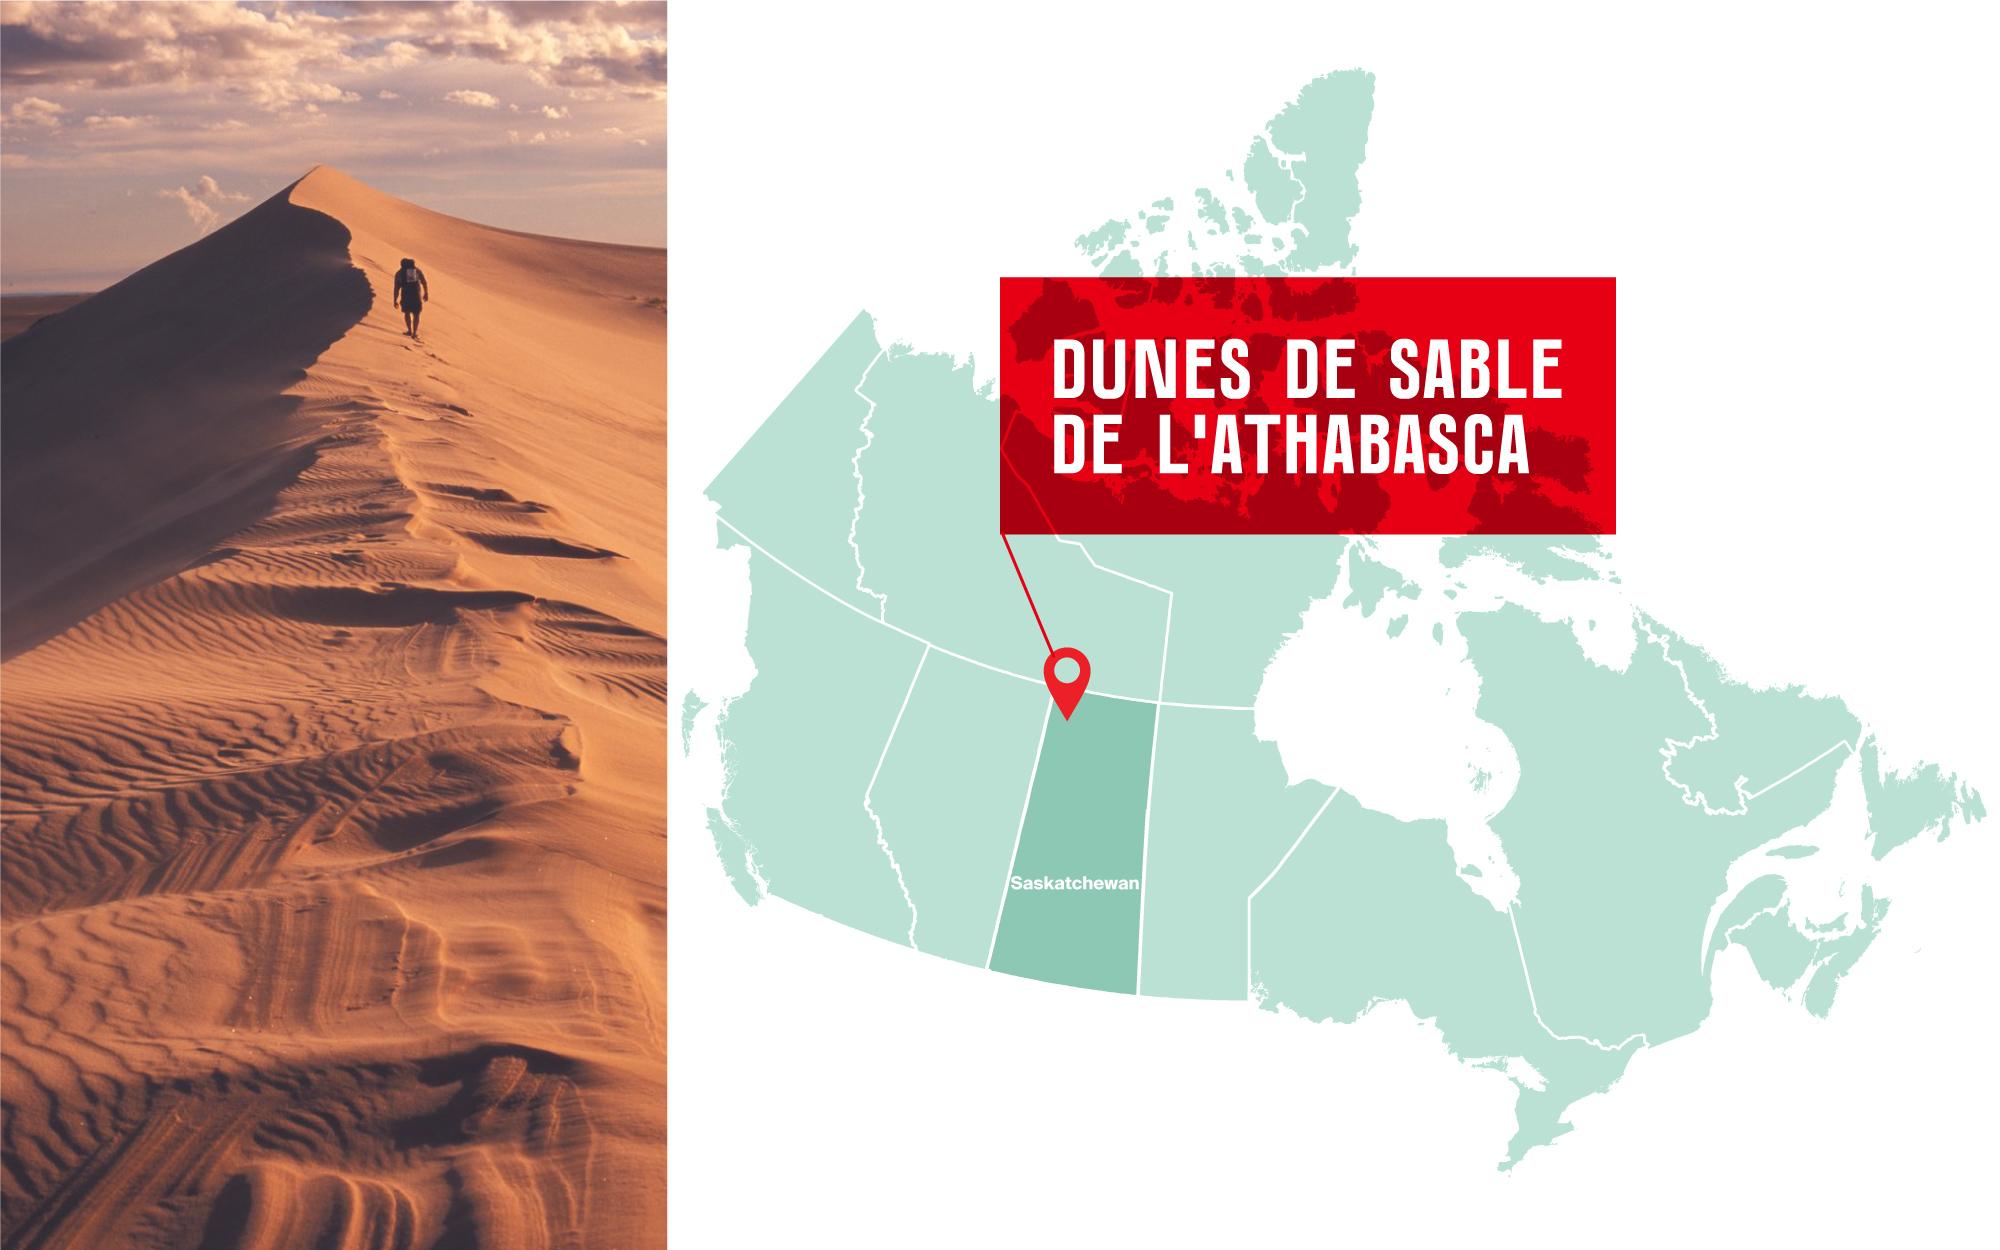 Source : Tourism Saskatchewan